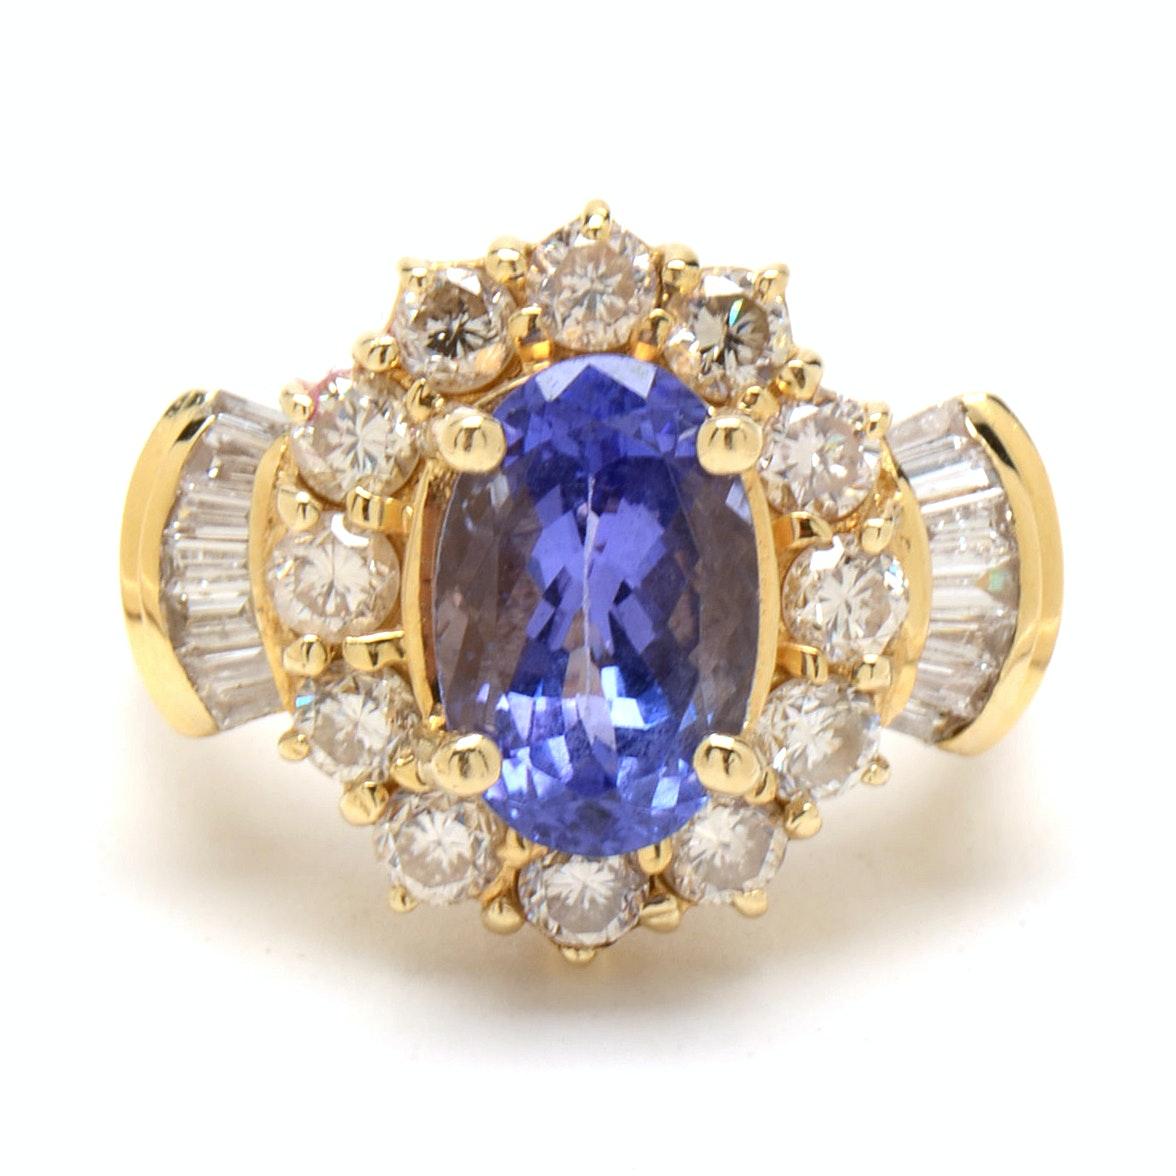 14K Yellow Gold 2.31 CTS Natural Tanzanite Diamond Cocktail Ring